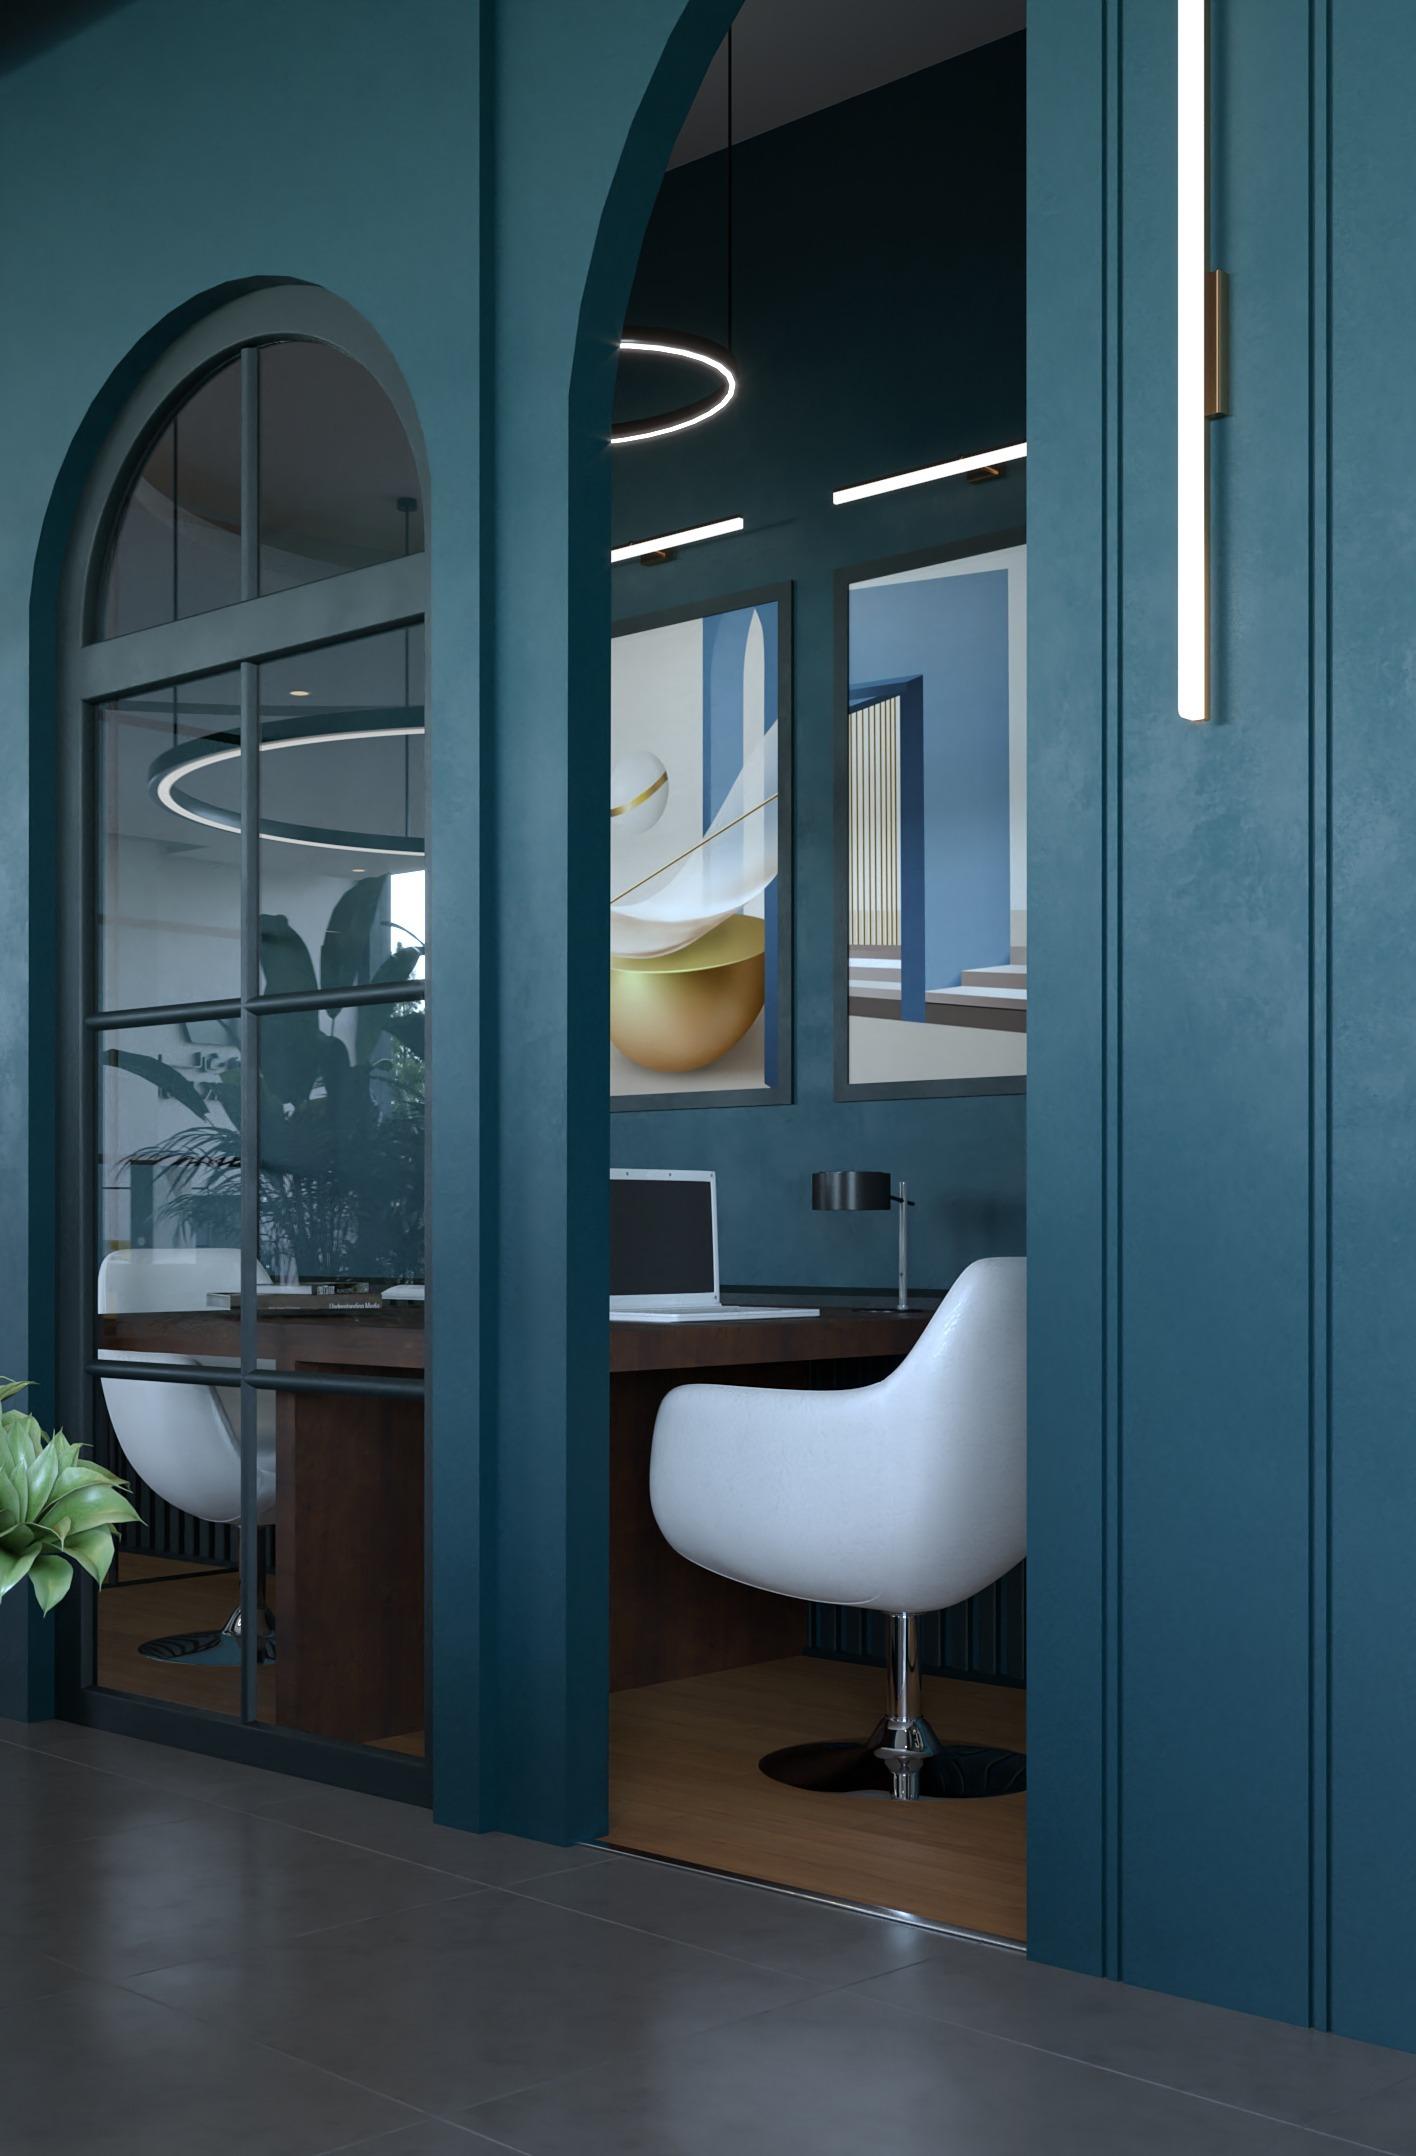 SHARIK HUB COMPANY DESIGN - PRIVET ZONE - UNIQUE COLOUR - white chairs - classy touch